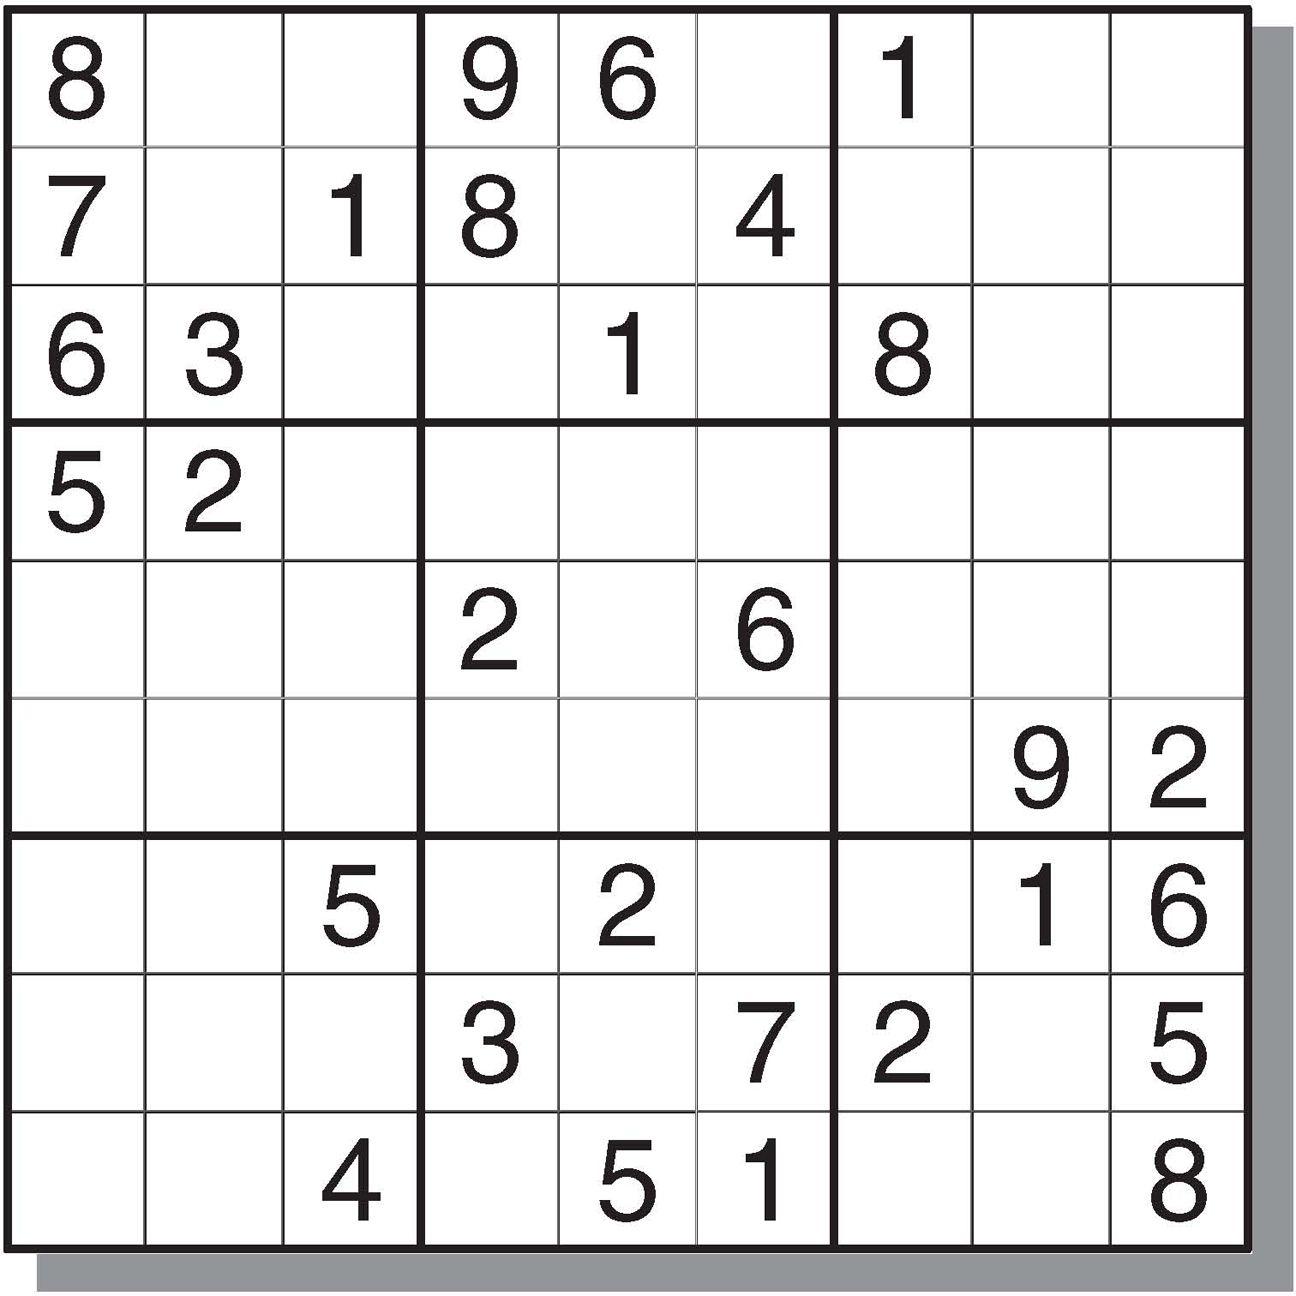 Free&easy Printable Sudoku Puzzles | Sudoku | Sudoku Puzzles, Games - Printable Sudoku Puzzles Krazydad